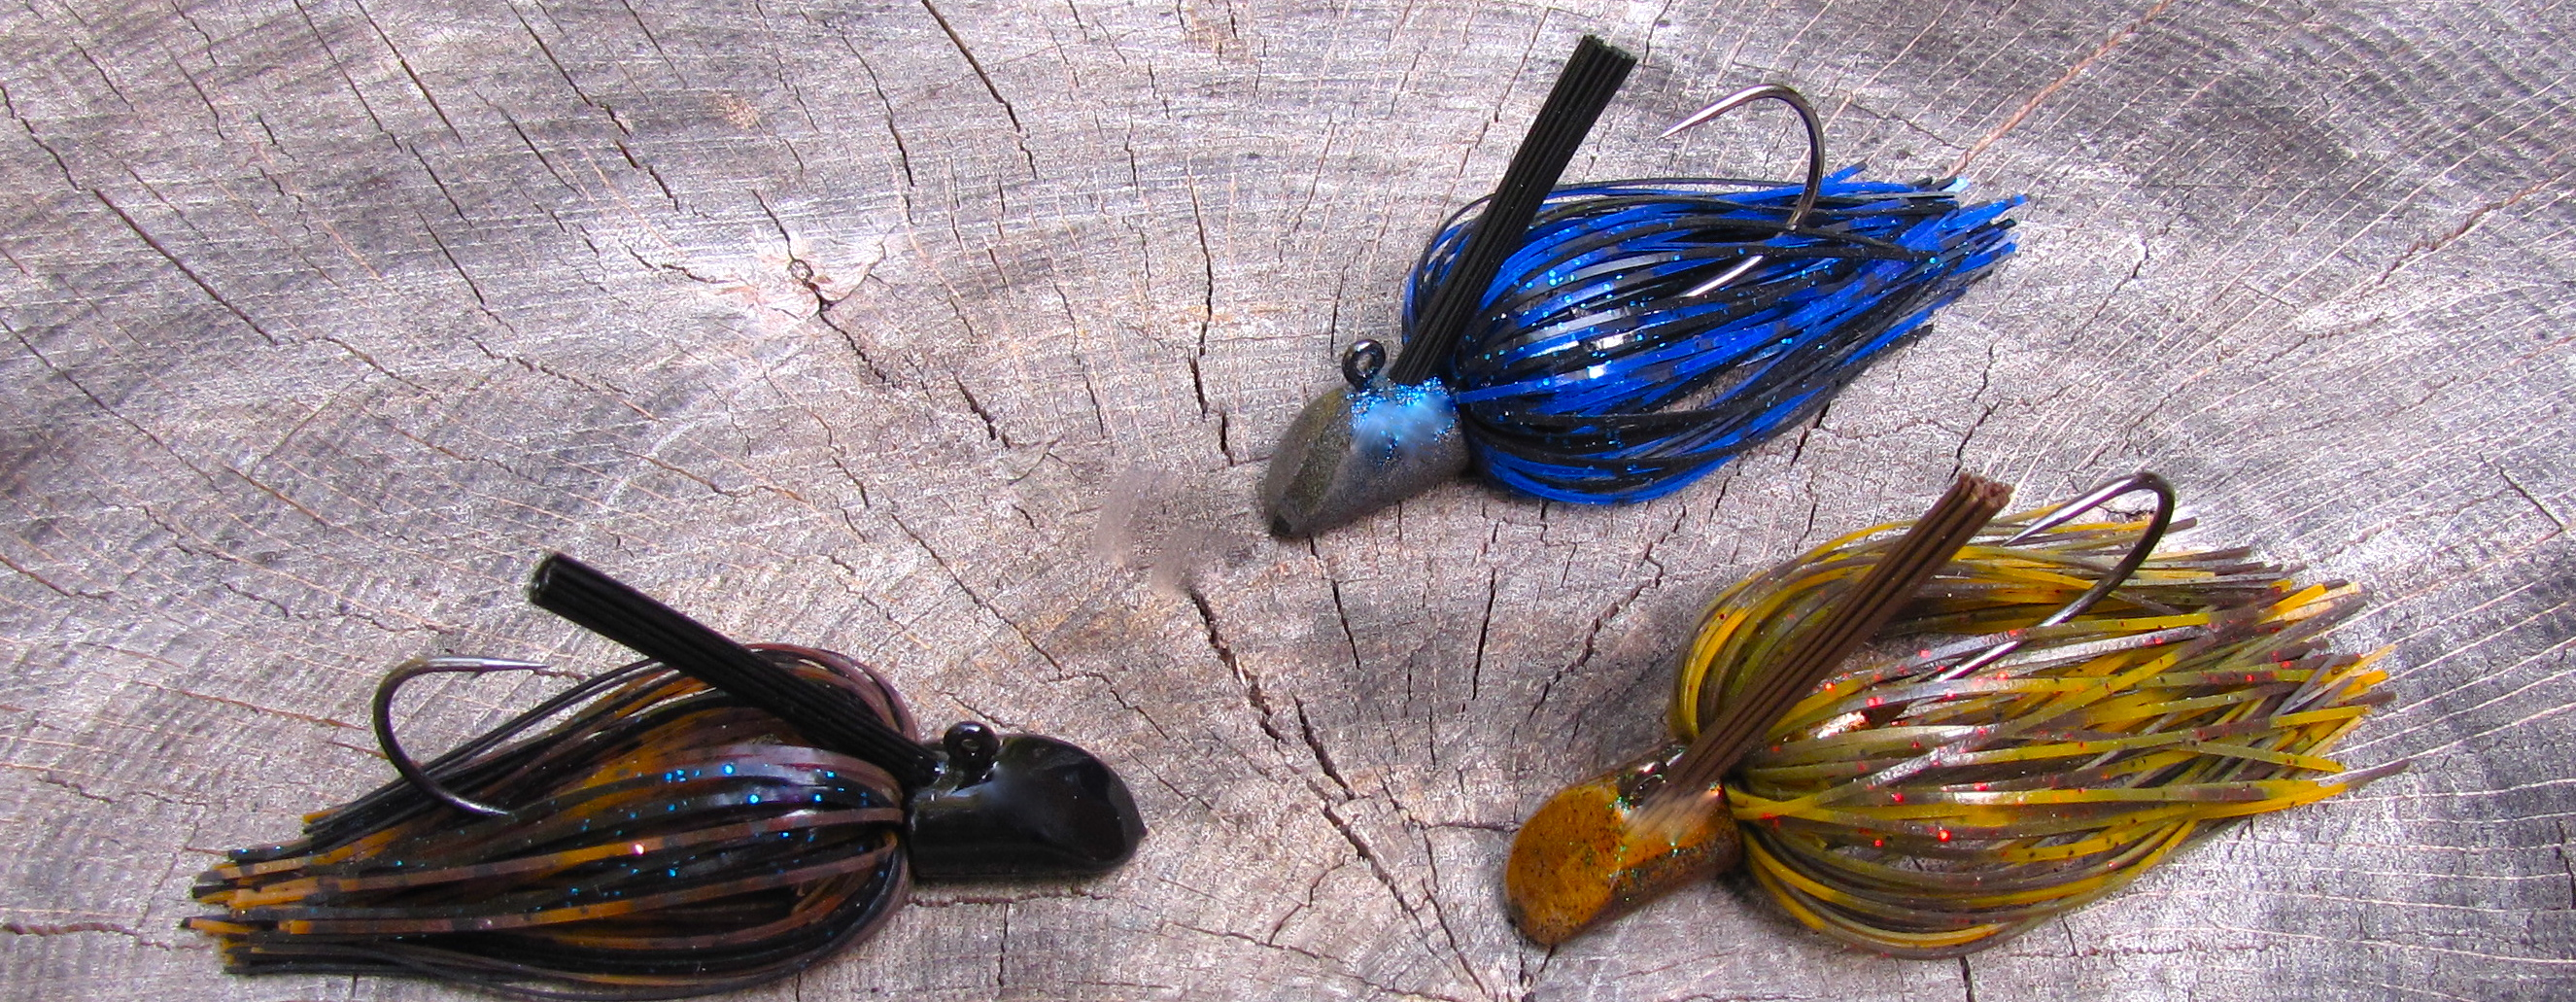 Fishing Frugal Lures Shovelhead Jigs